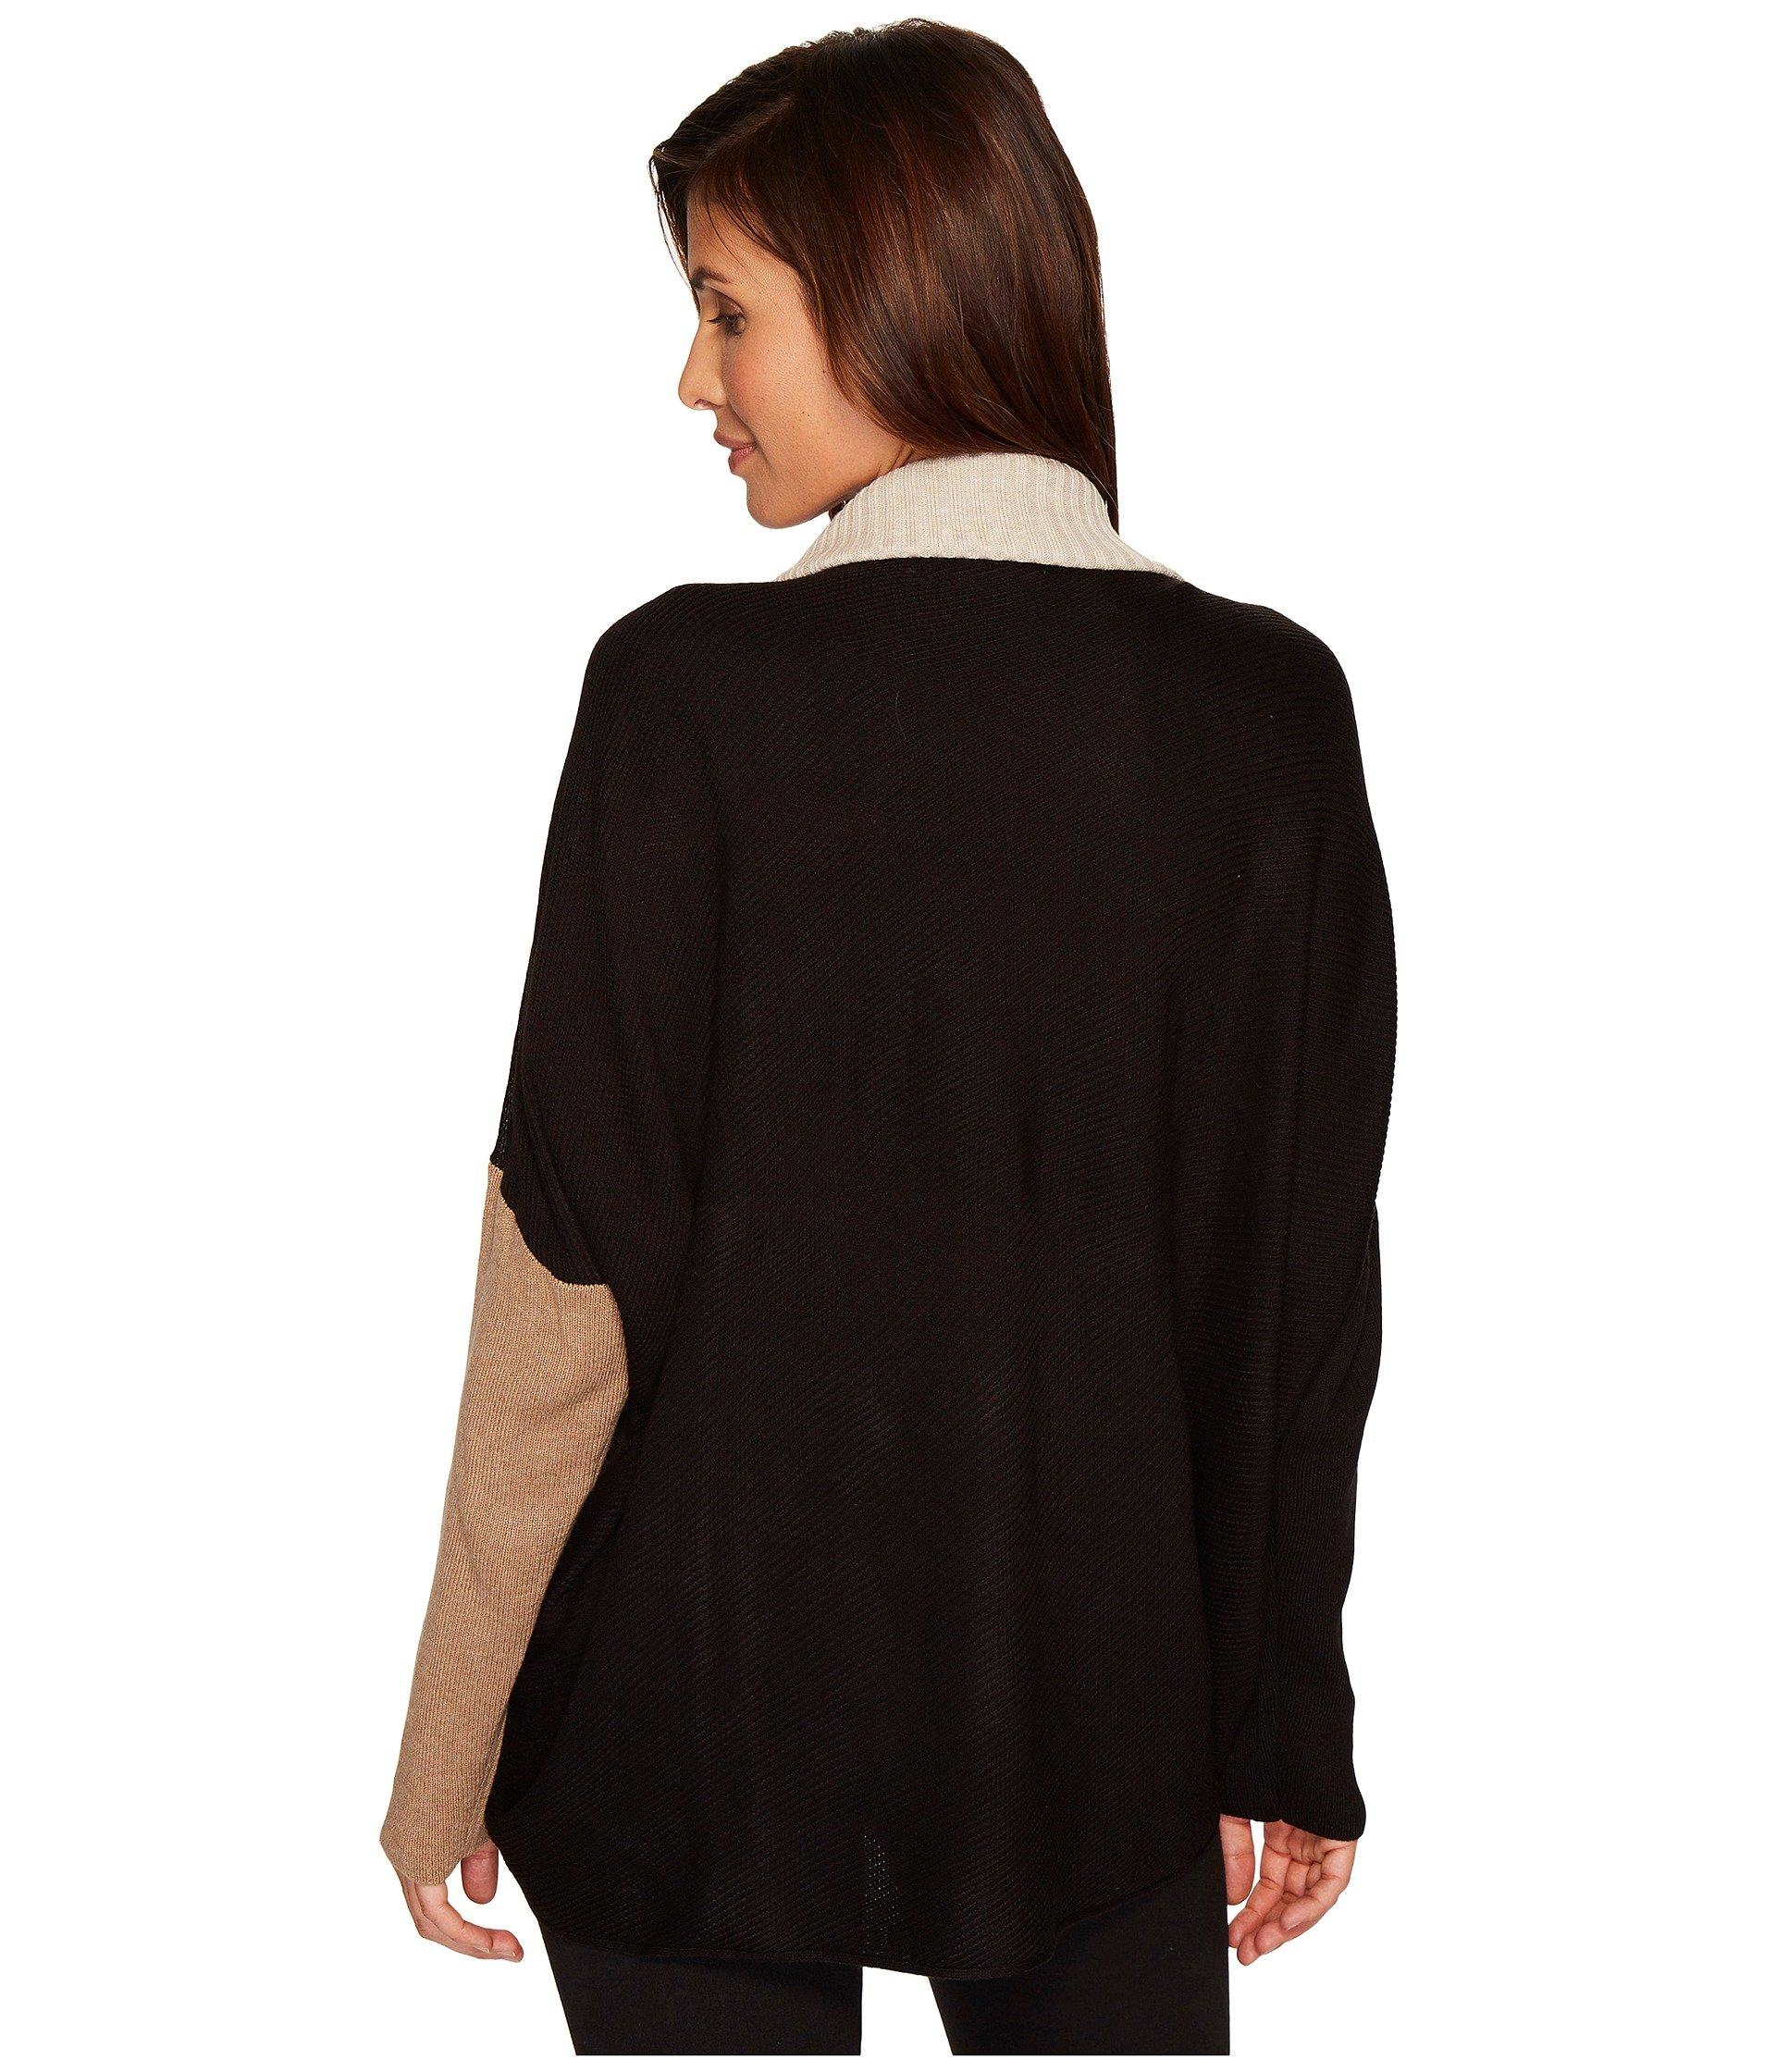 Ivanka Trump Cowl Neck Bat Wing Stripe Sweater at Zappos.com